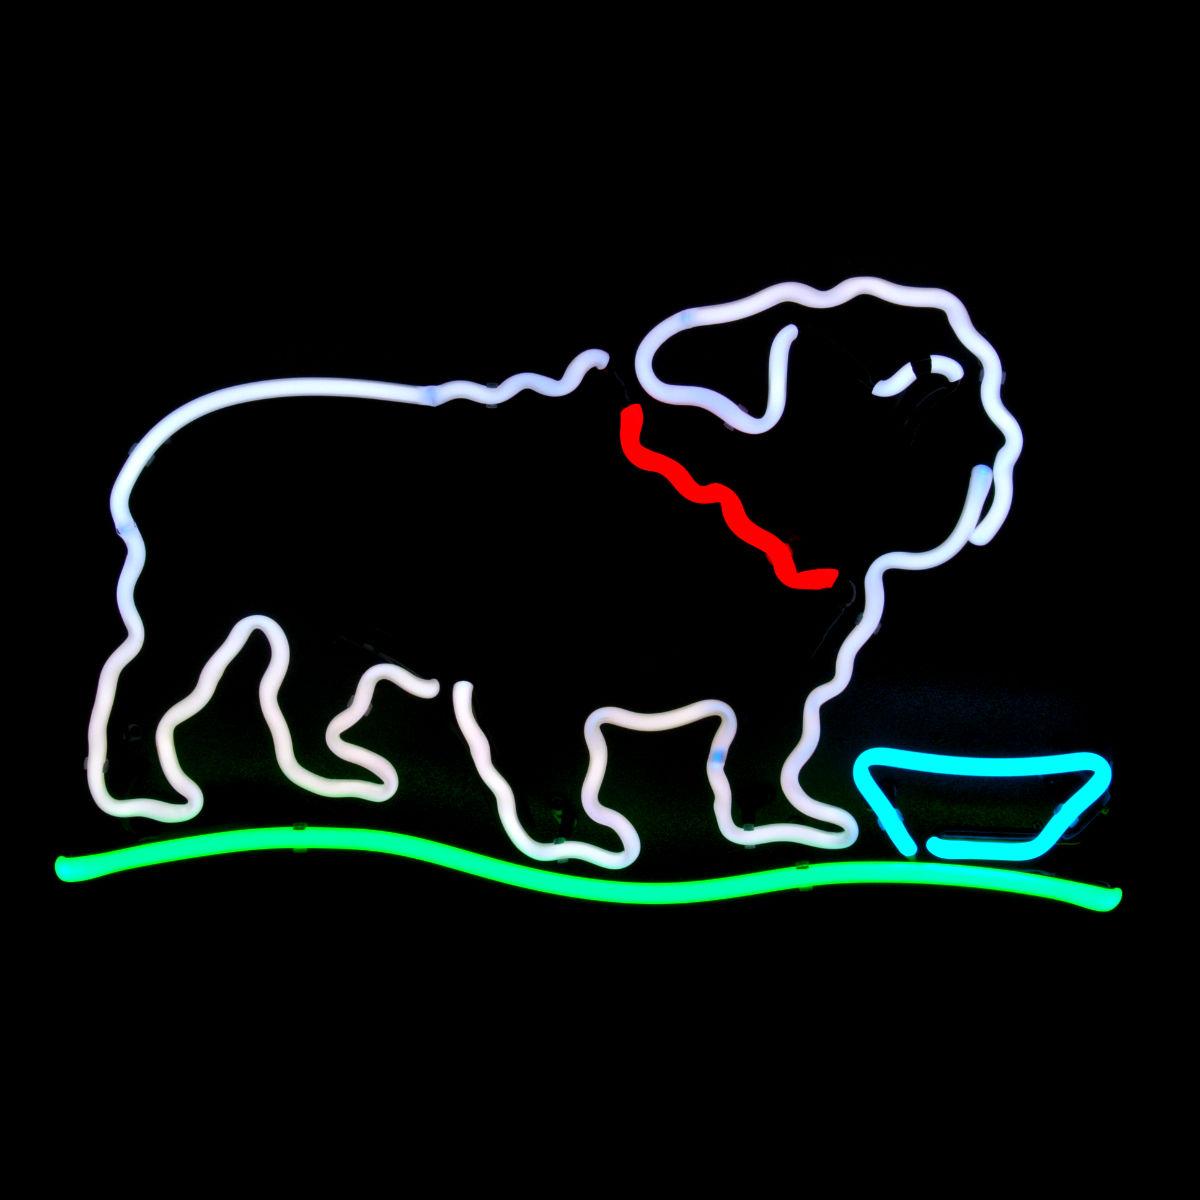 Custom Dog Neon Light Sculptures by John Barton - BartonNeonMagic.com